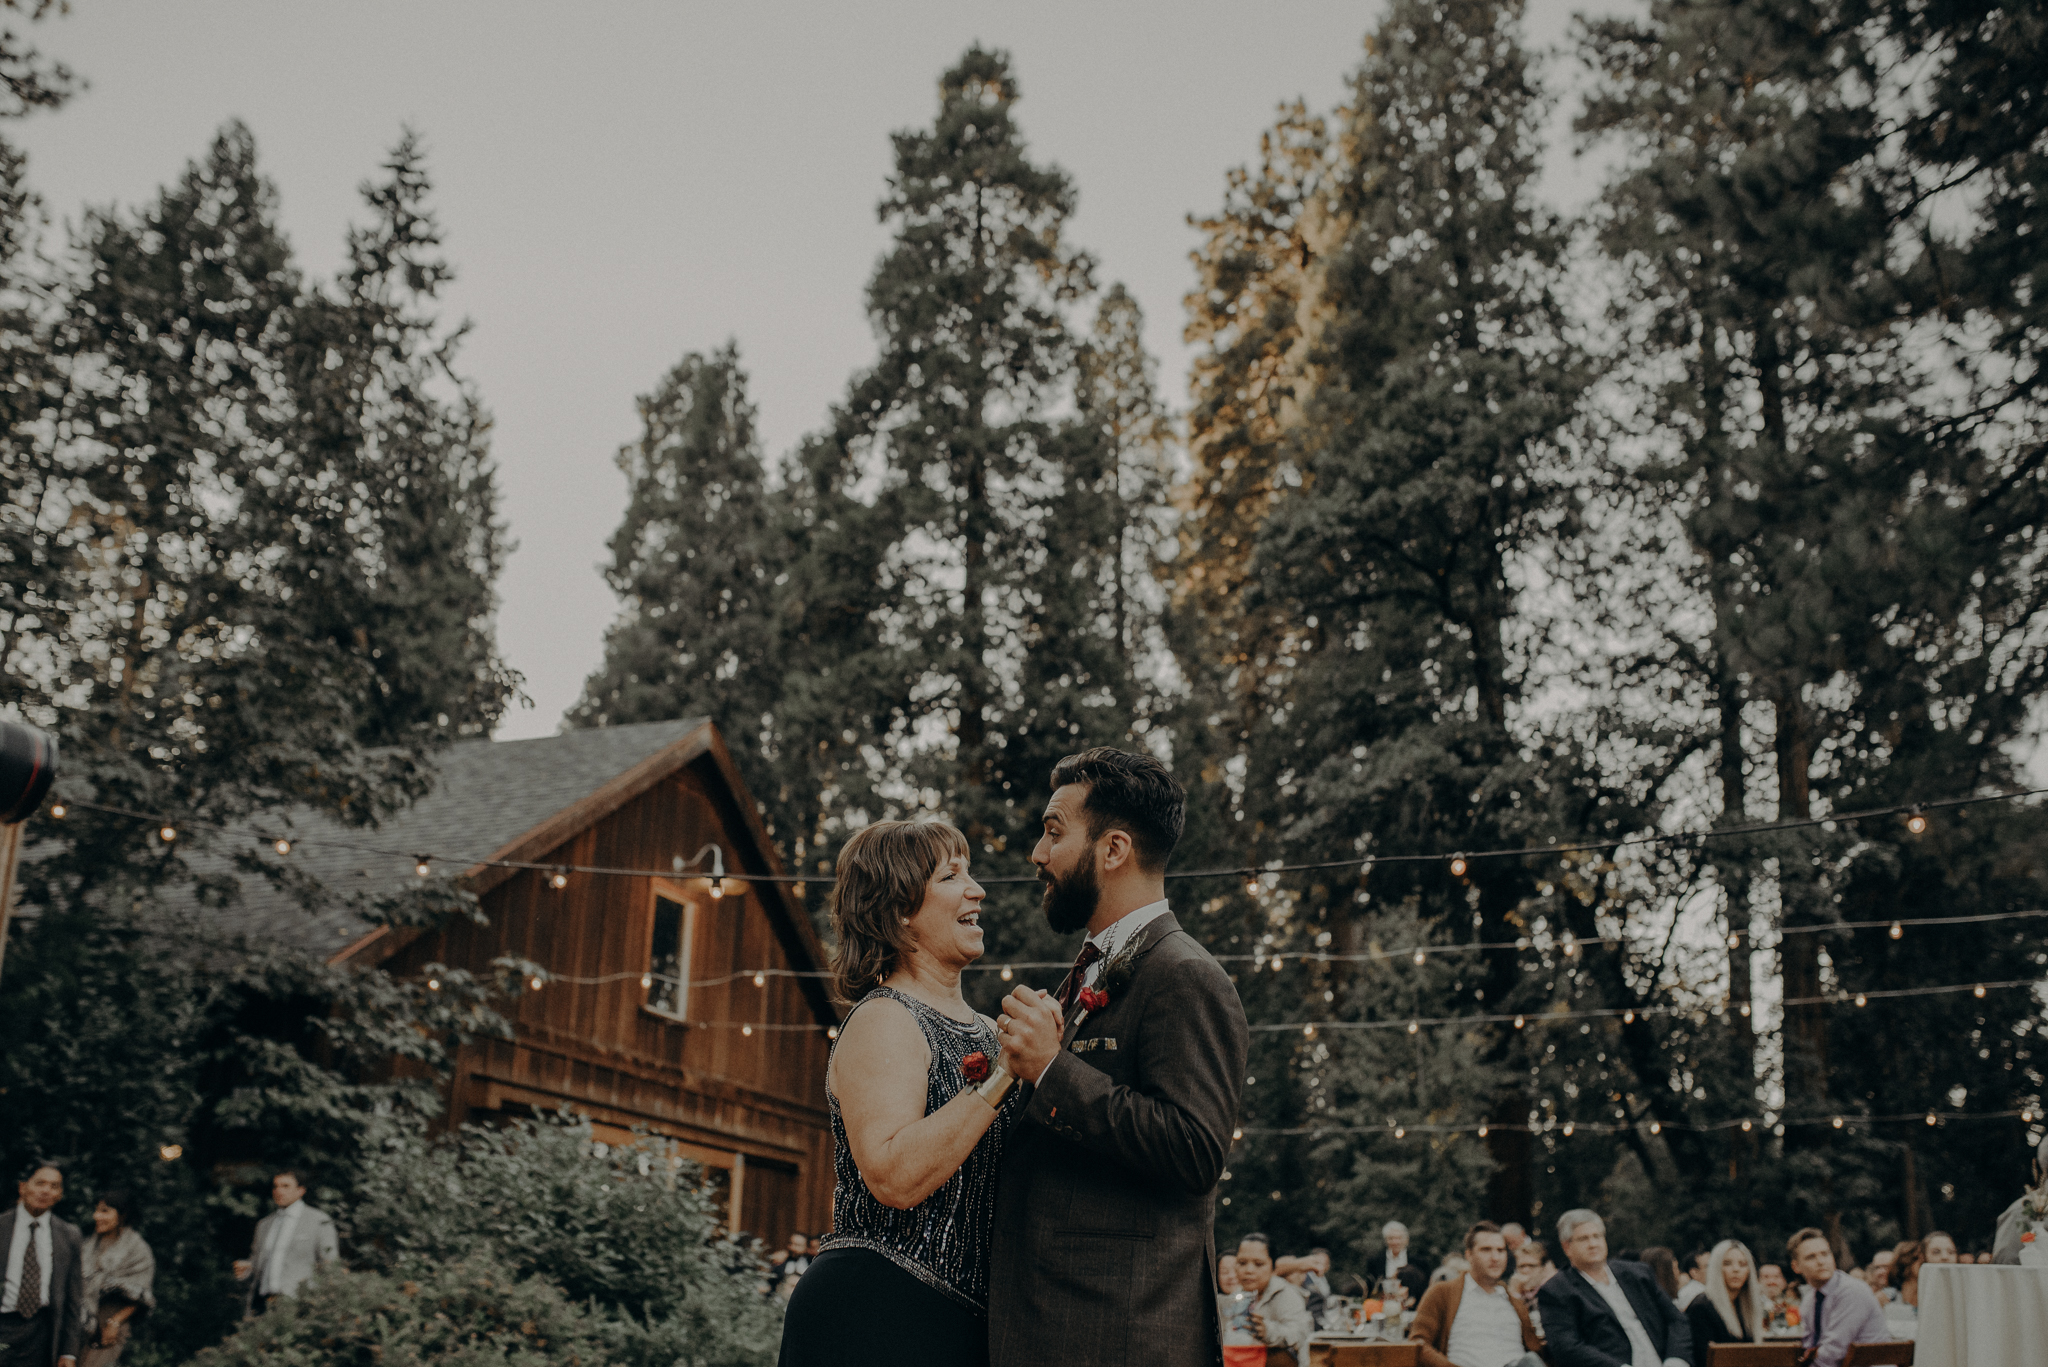 Yosemite Elopement Photographer - Evergreen Lodge Wedding Photographer - IsaiahAndTaylor.com-127.jpg